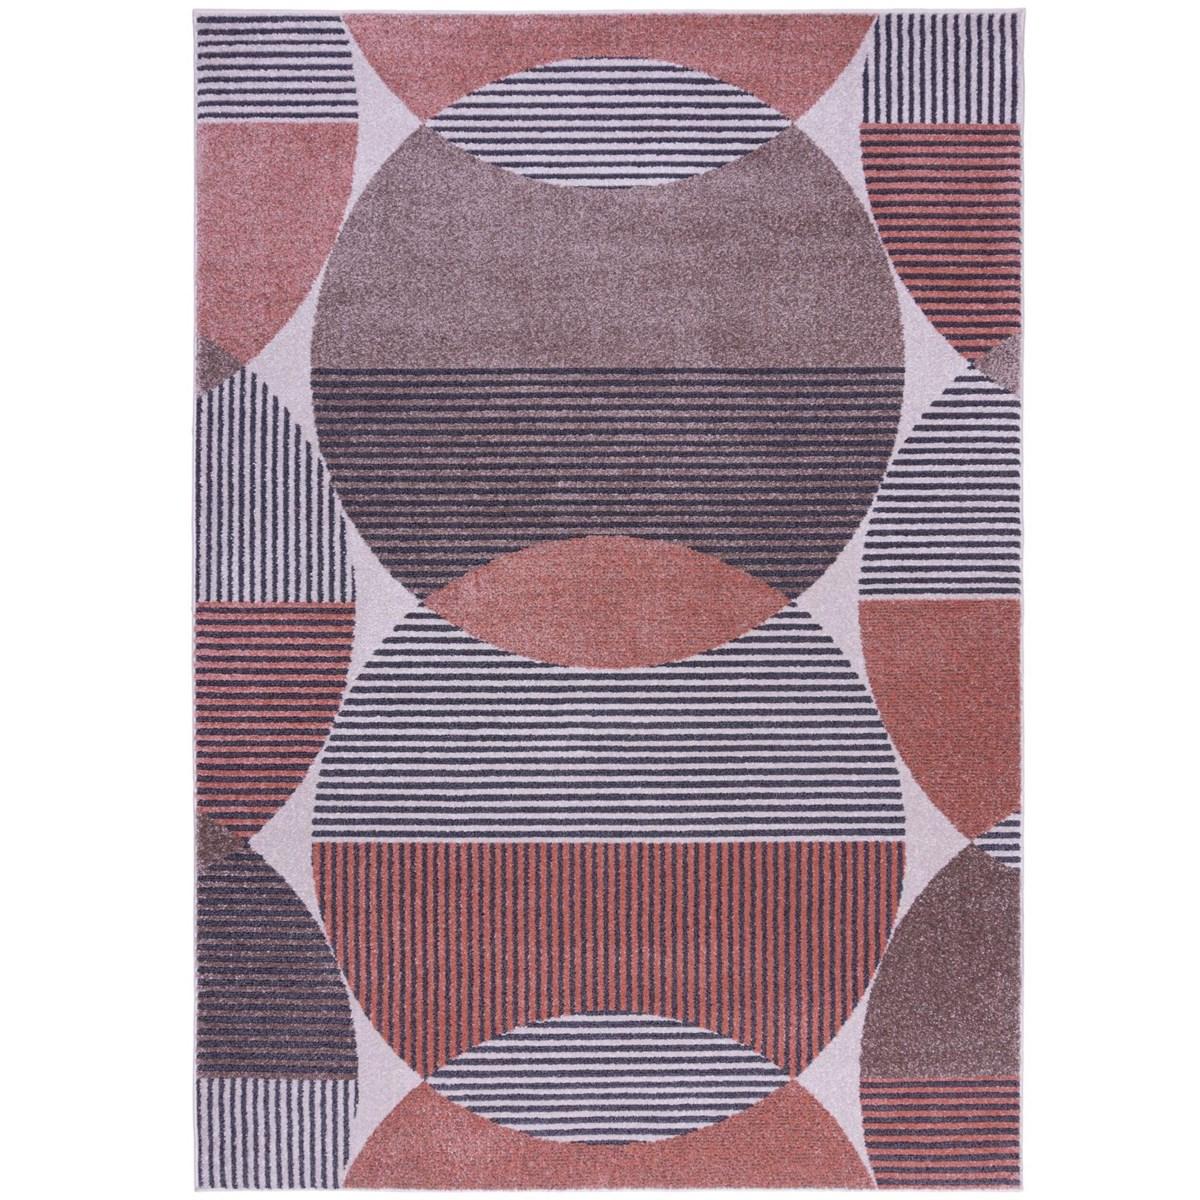 Tapis de salon en Polypropylène Rose foncé 160x230 cm